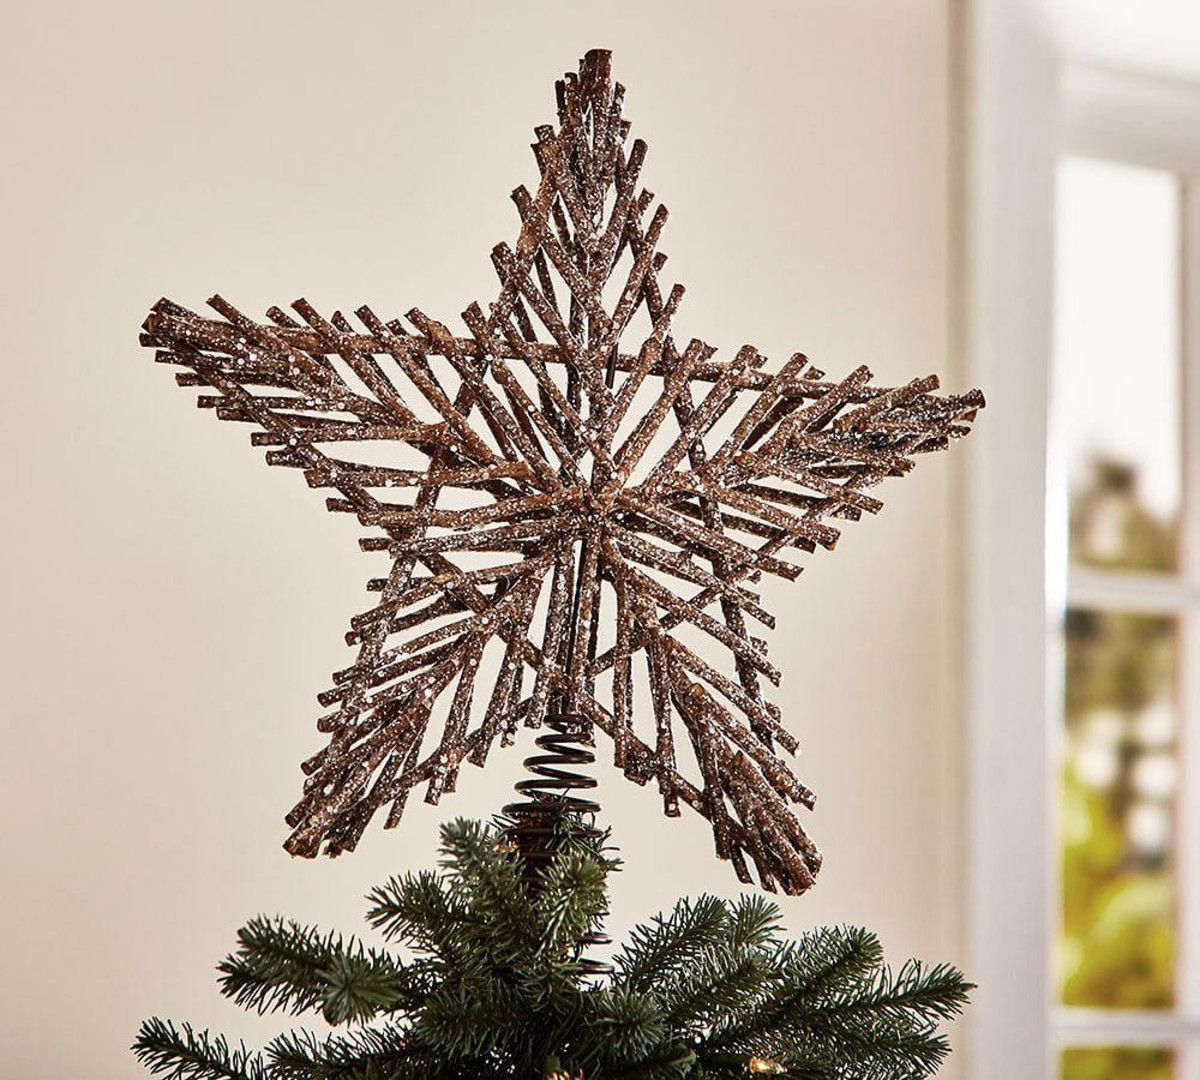 Twig Star Tree Topper Pottery Barn Au Diy Christmas Tree Topper Christmas Tree Topper Rustic Diy Tree Topper